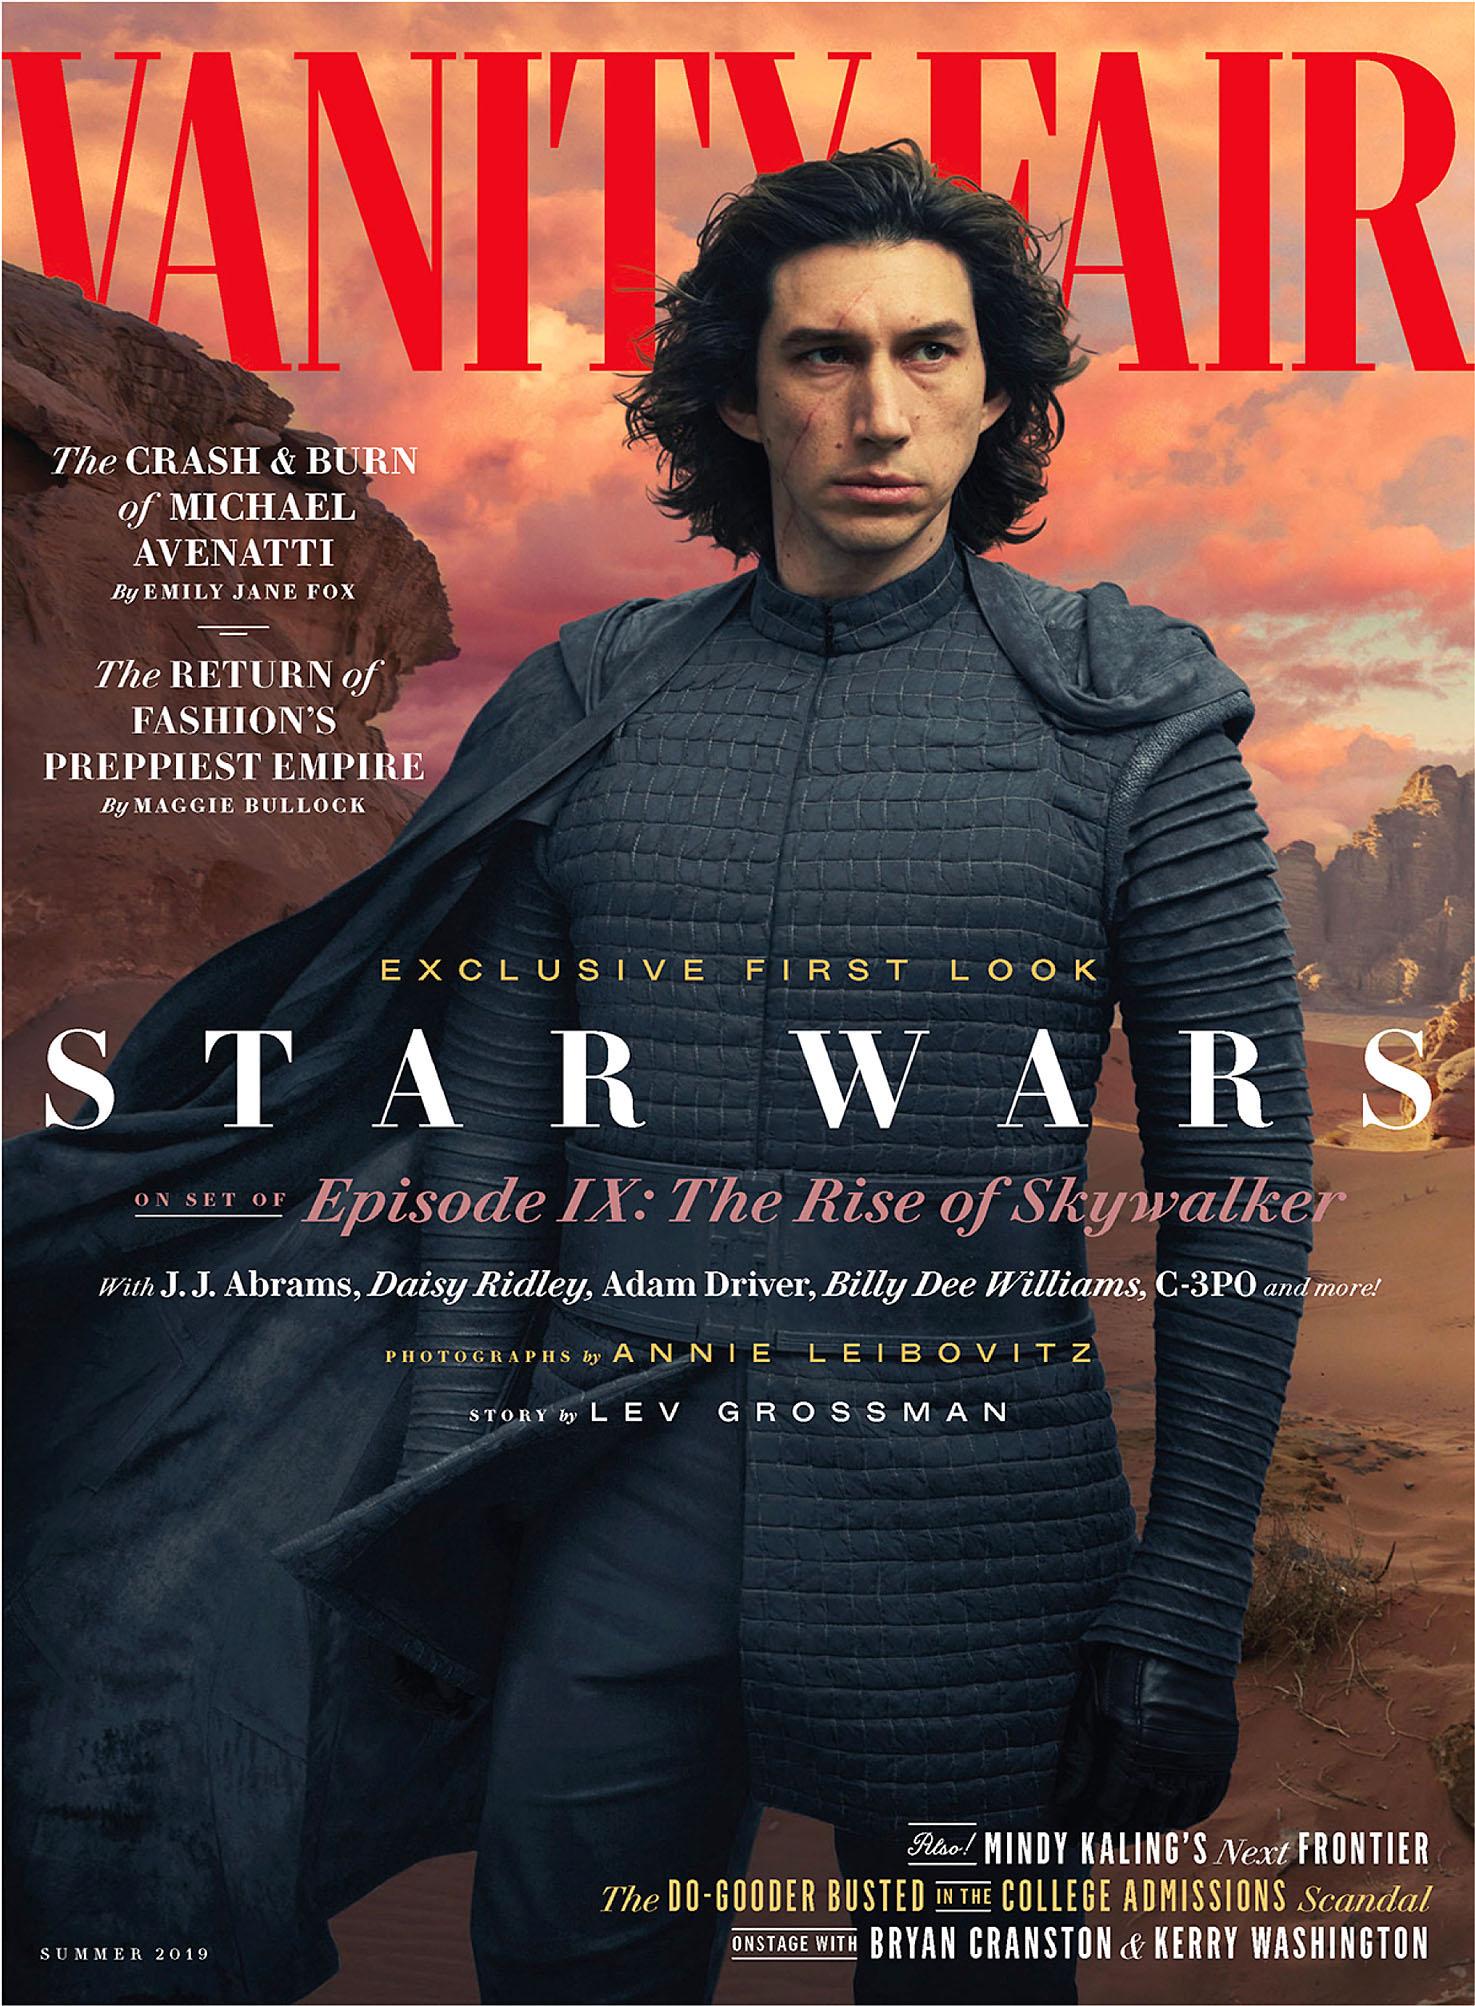 Vanity Fair Summer 2019 Star Wars01.jpg